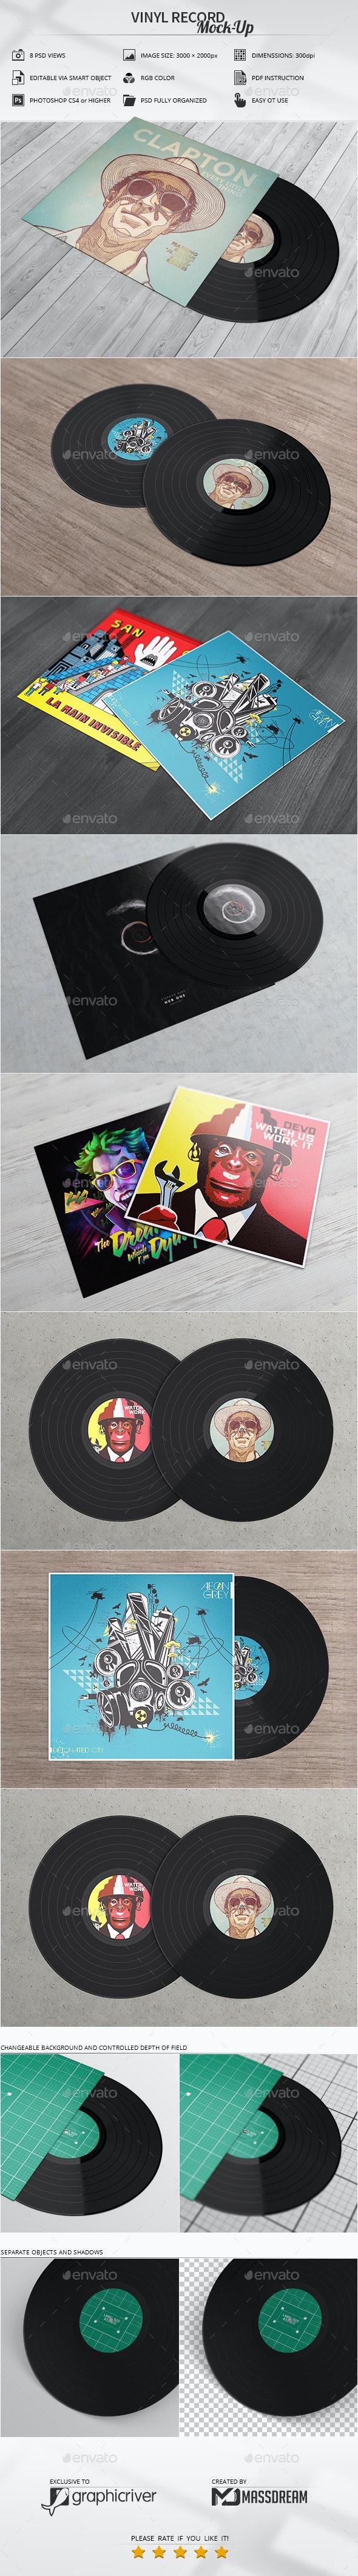 Vinyl Record Mock-Up - Product Mock-Ups Graphics